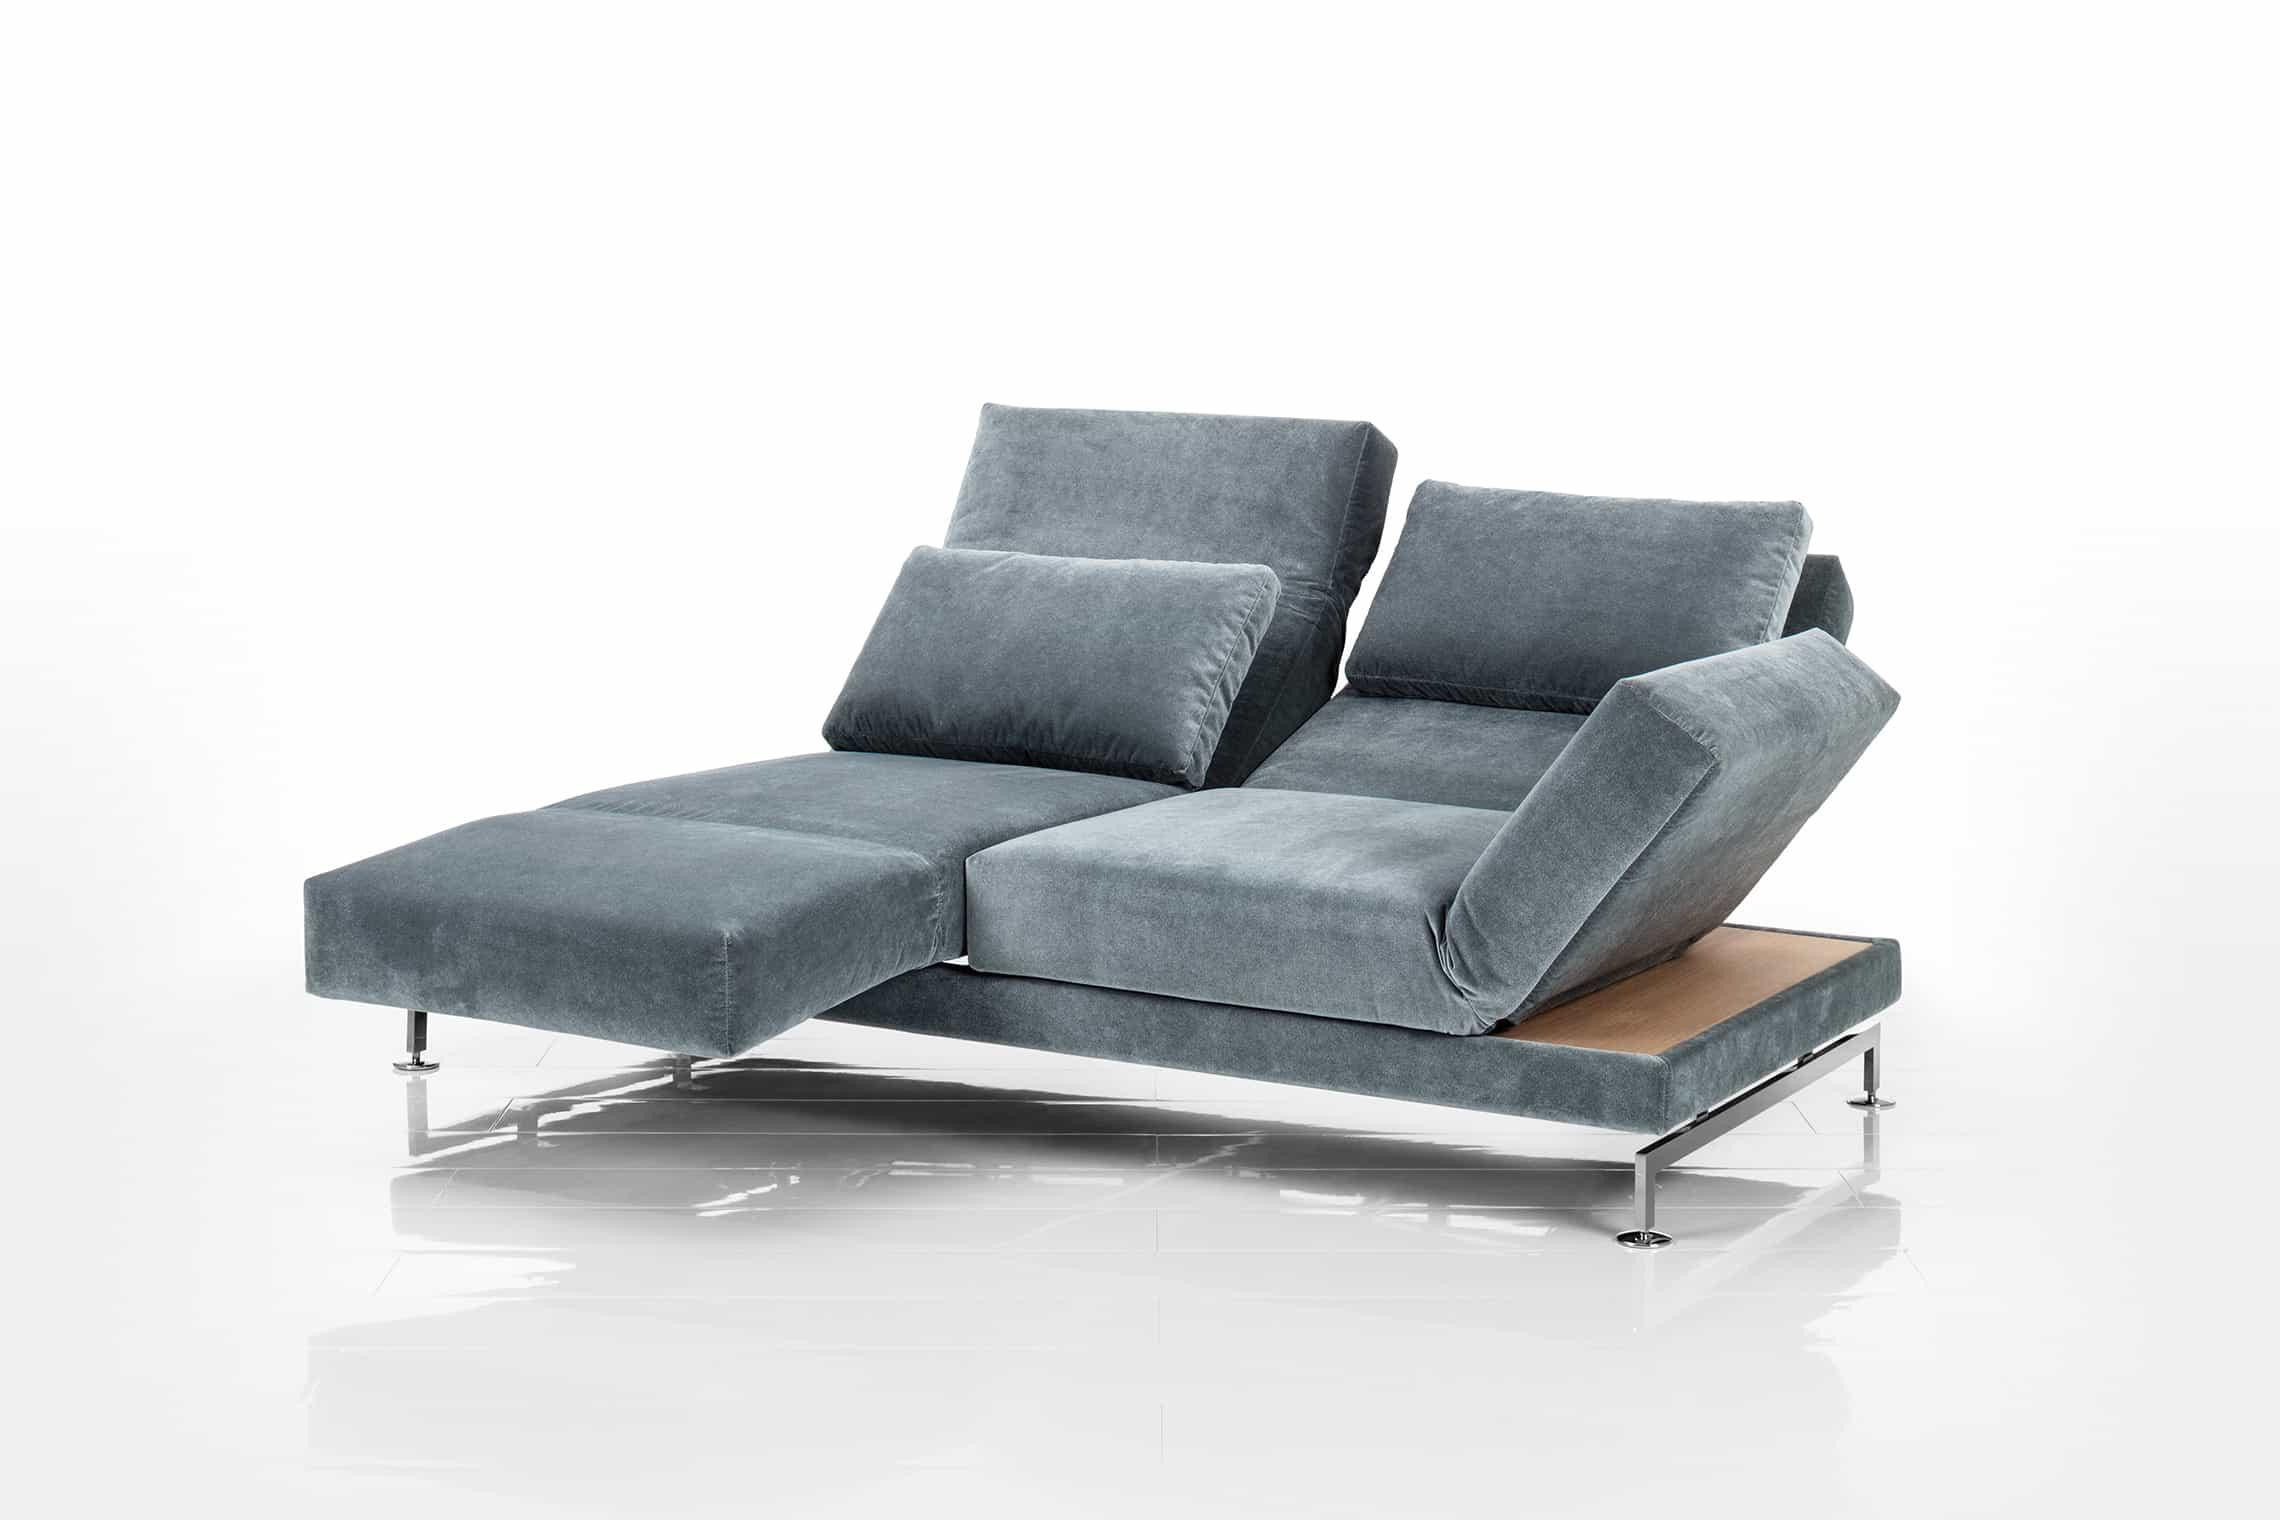 Full Size of Sofa Mit Relaxfunktion 3 Sitzer 3er Grau Leder Braun Schlafsofa Liegefläche 160x200 Verstellbarer Sitztiefe Garnitur Bezug Ecksofa Ottomane Mega Big Hocker Sofa Sofa Brühl